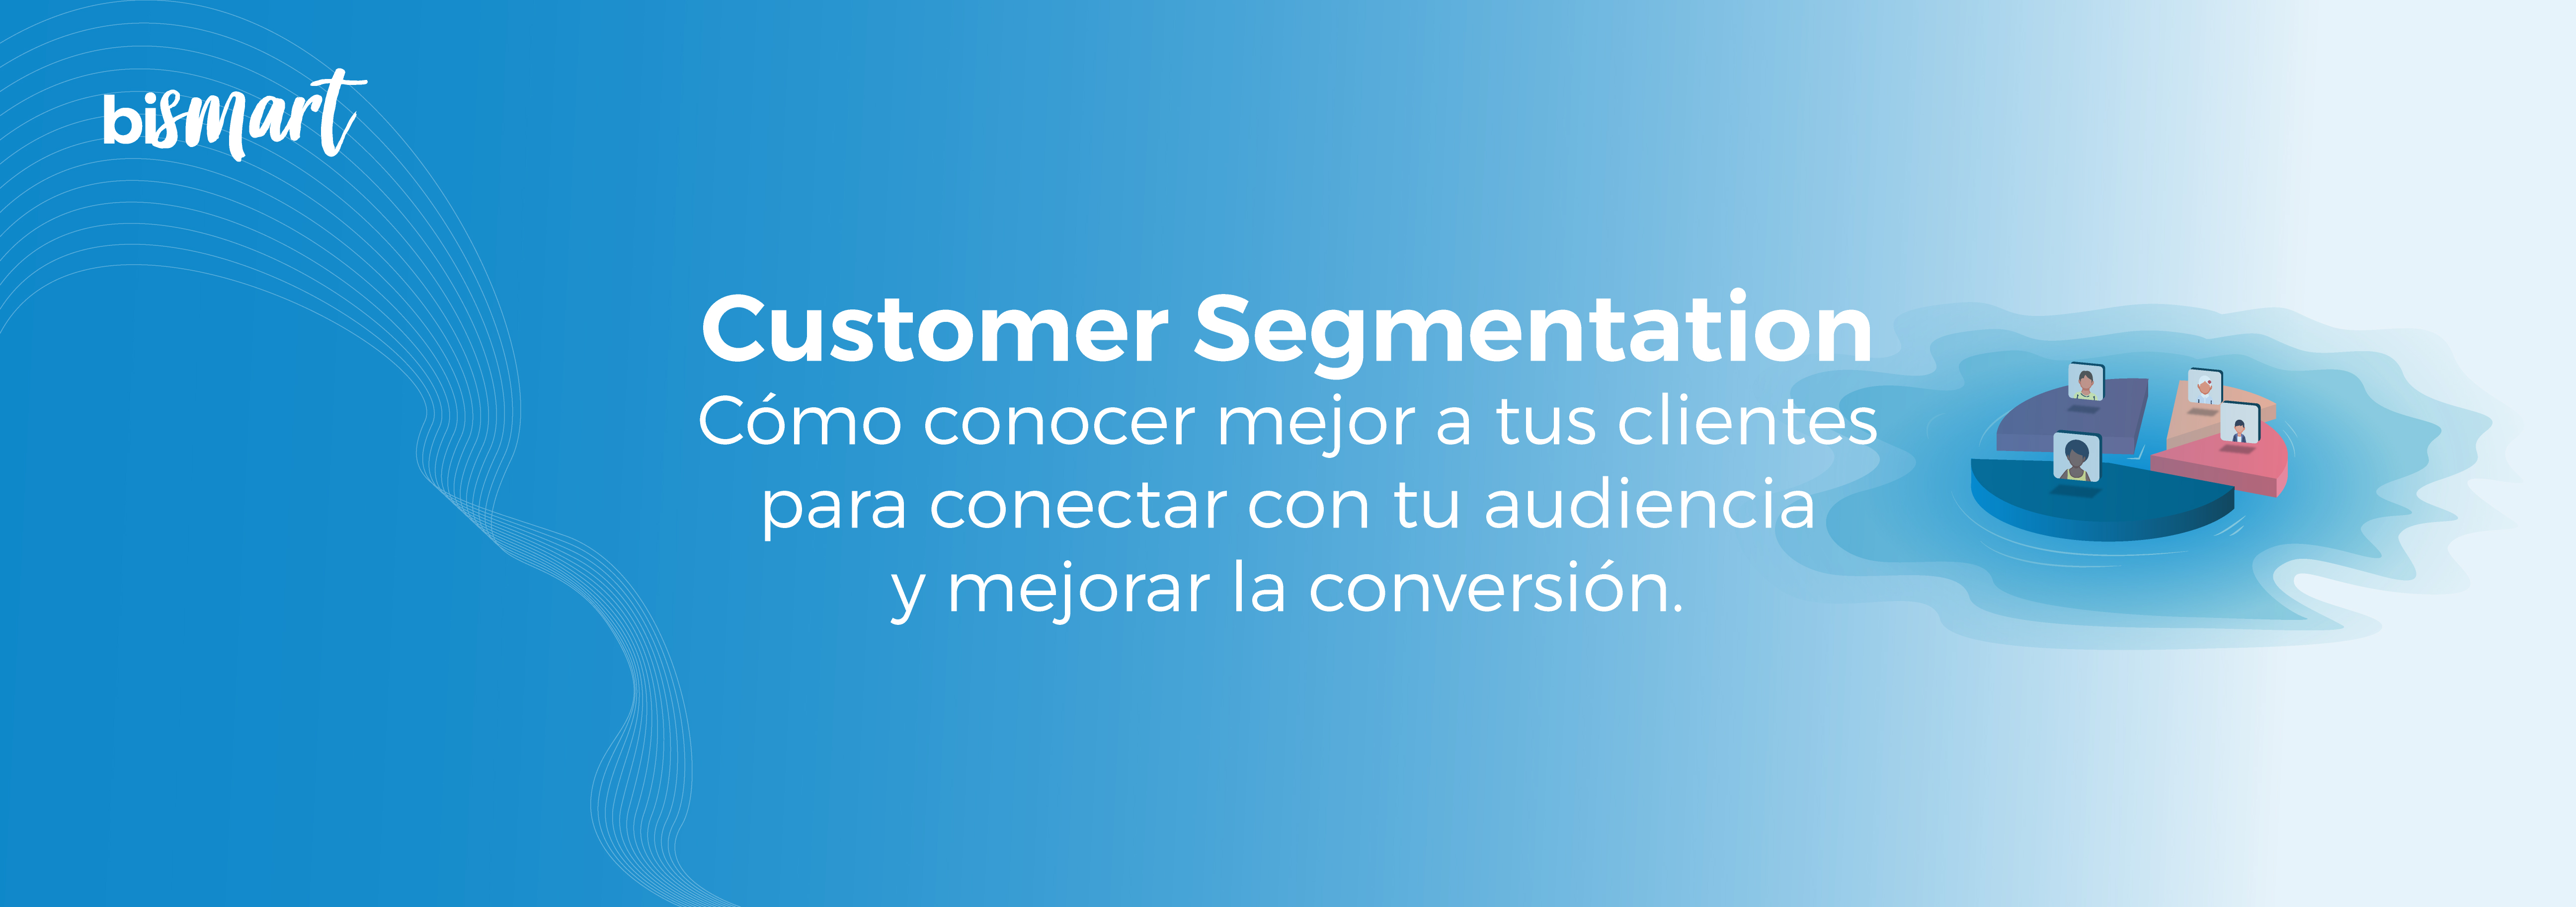 Customar-Segmentation-Landing-01